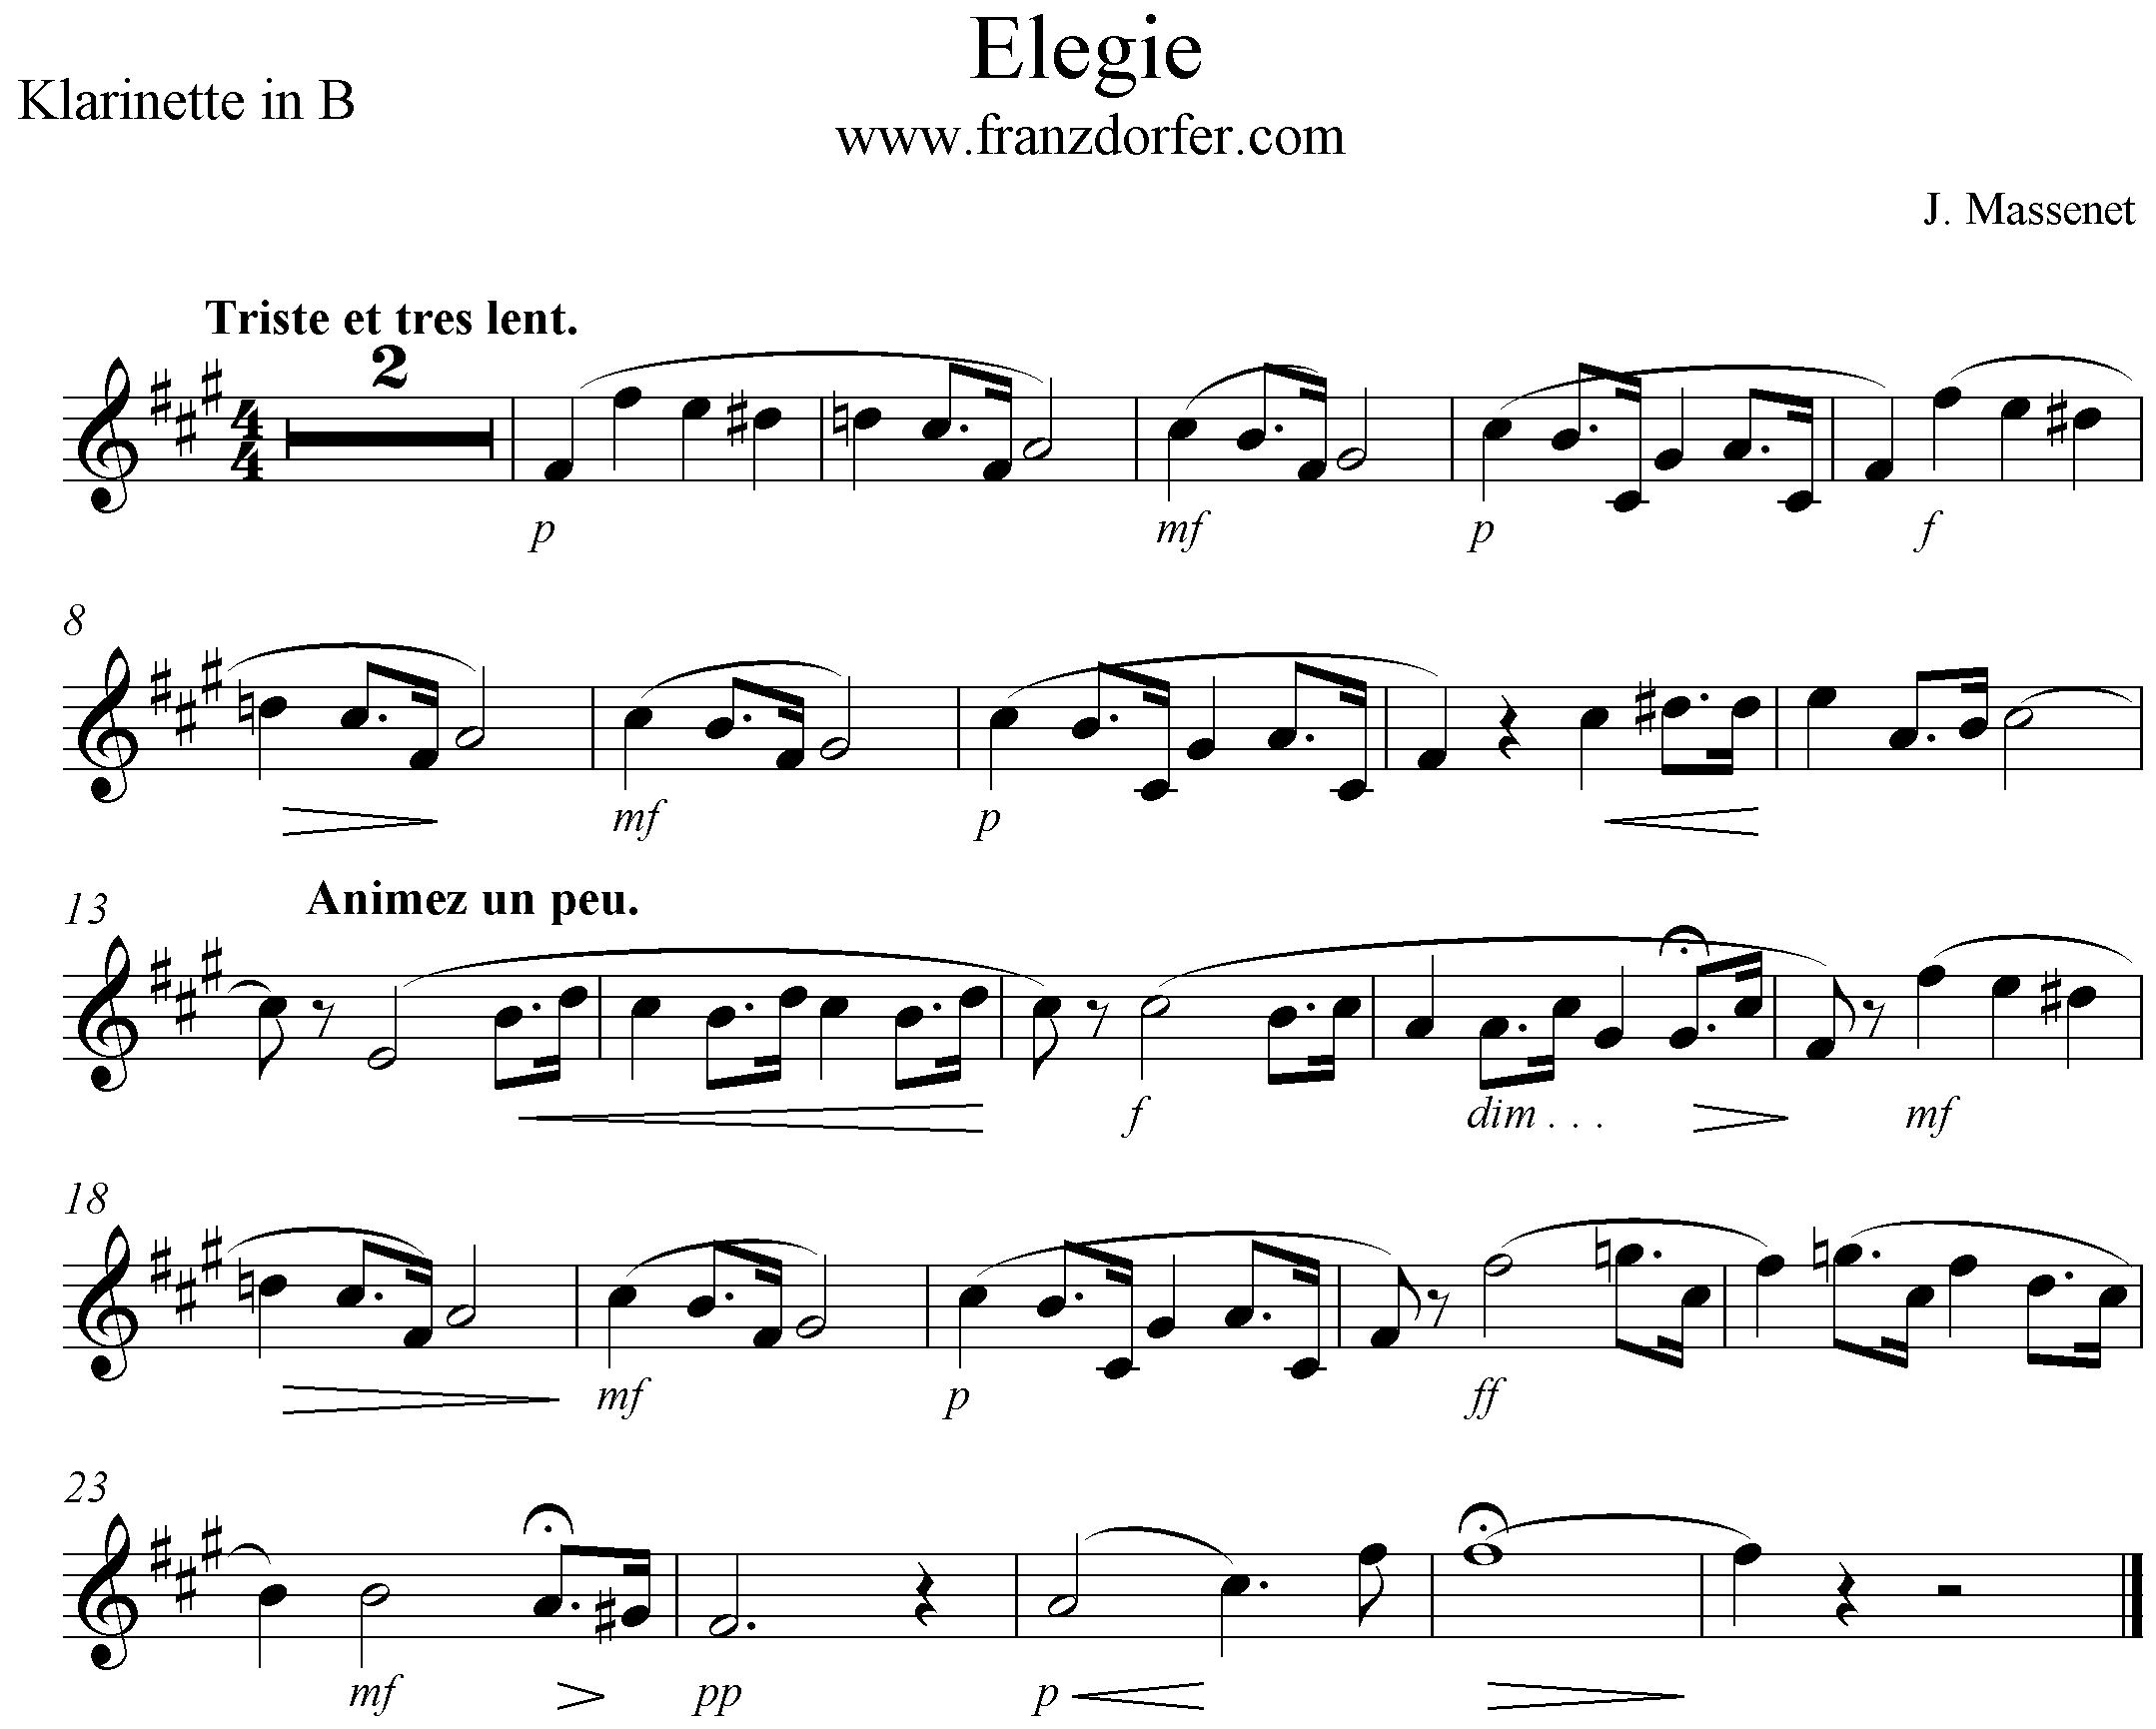 clarinet Elegie Massenet